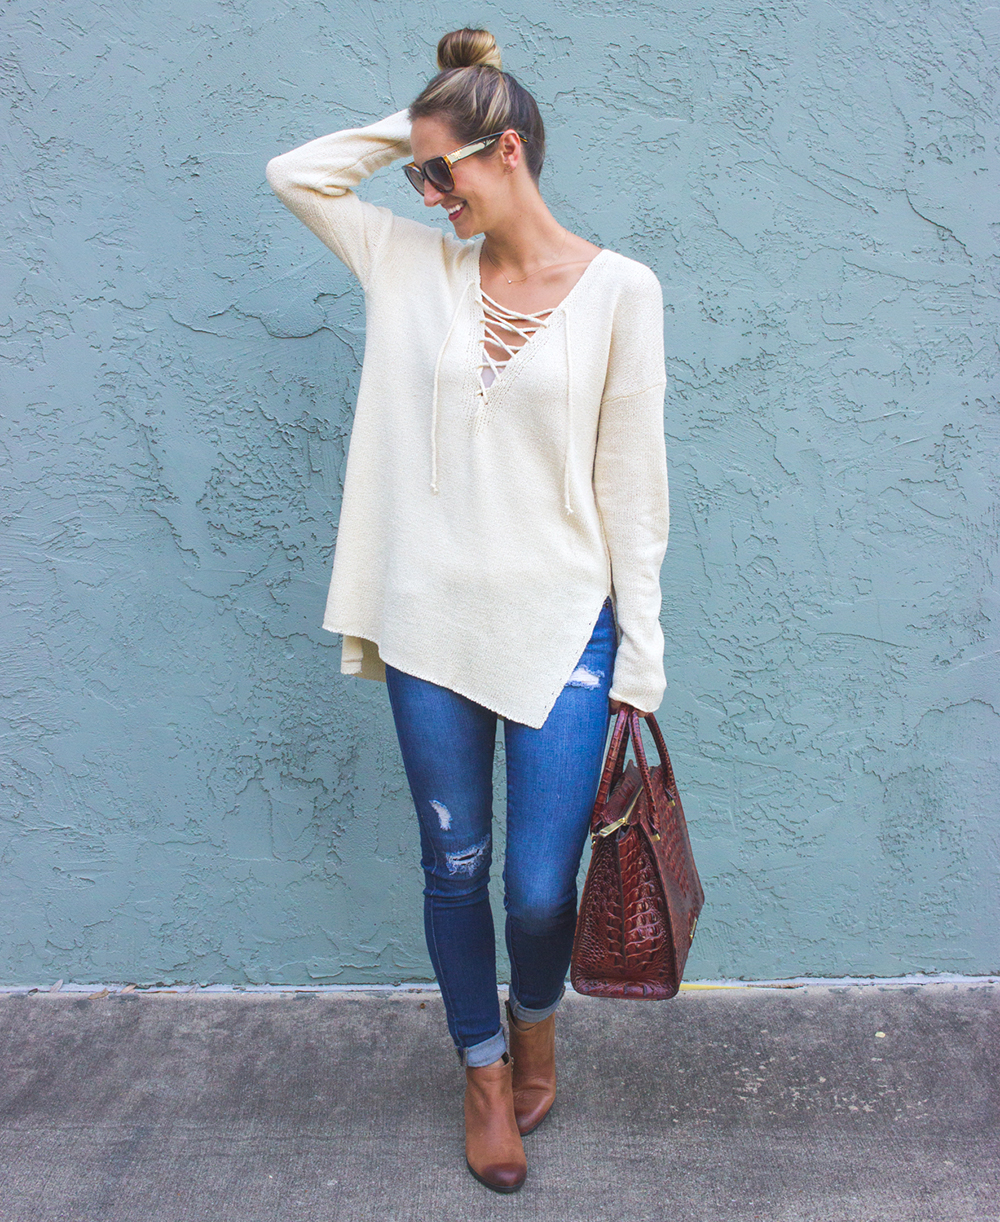 livvyland-blog-olivia-watson-knit-sweater-jeans-booties-zappos-clarks-ankle-boots-gelata-italia-brahmin-priscilla-handbag-1